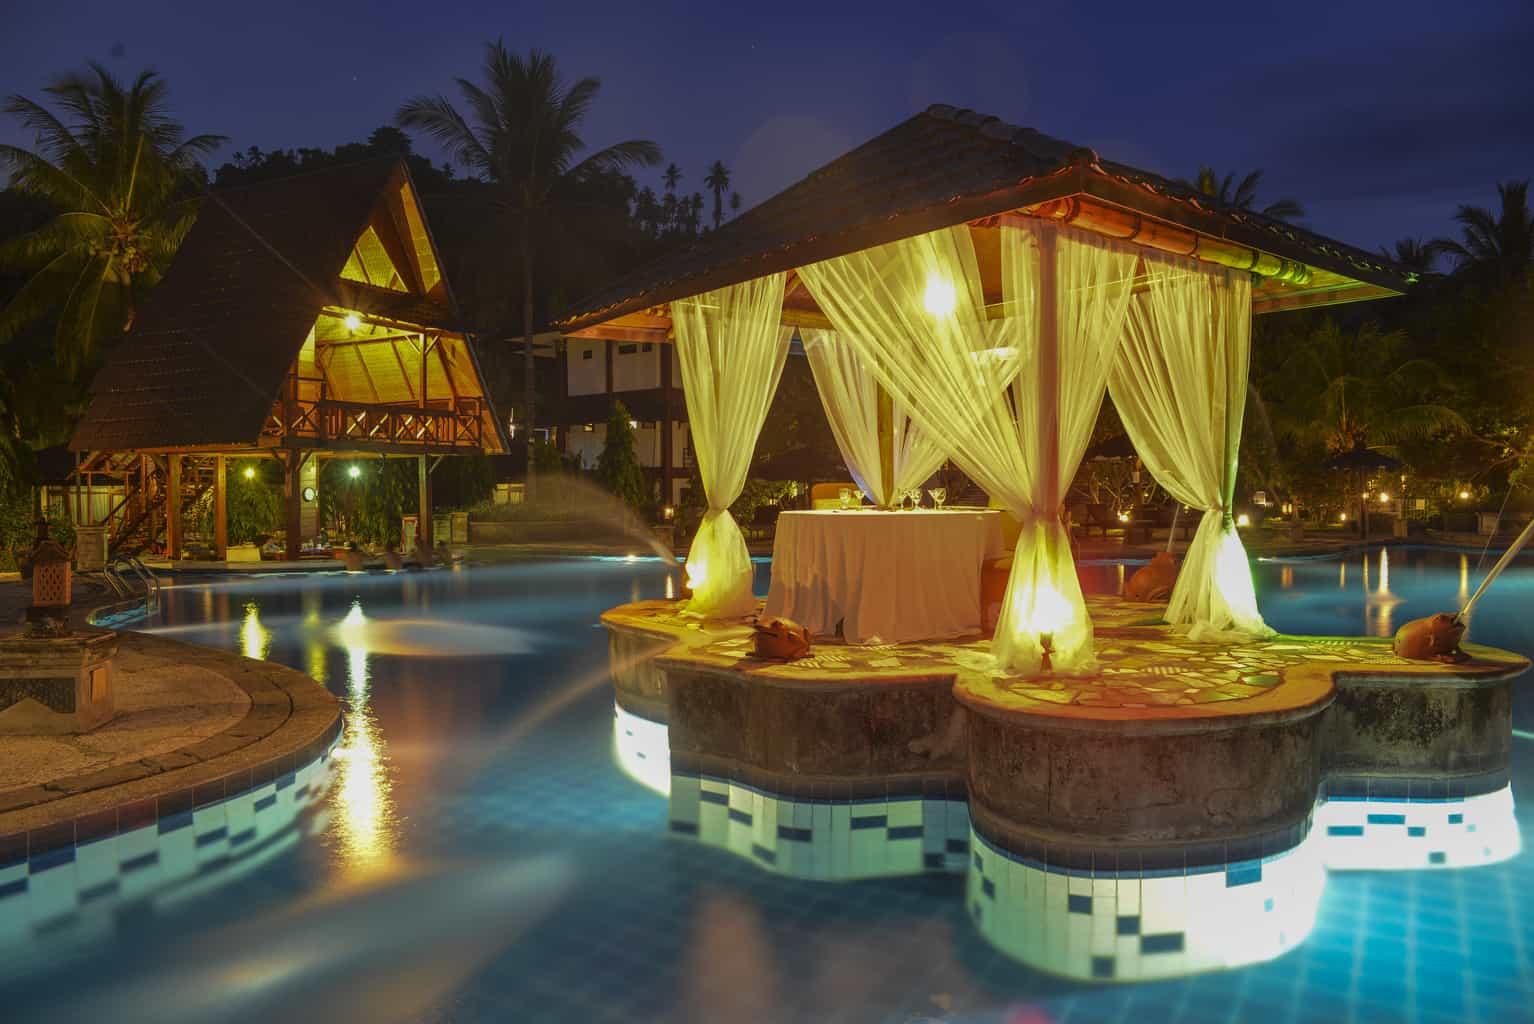 Indonesia Diving Holiday North Sulawesi Tasik Ria Resort Gazebo And Pool Bar Evening